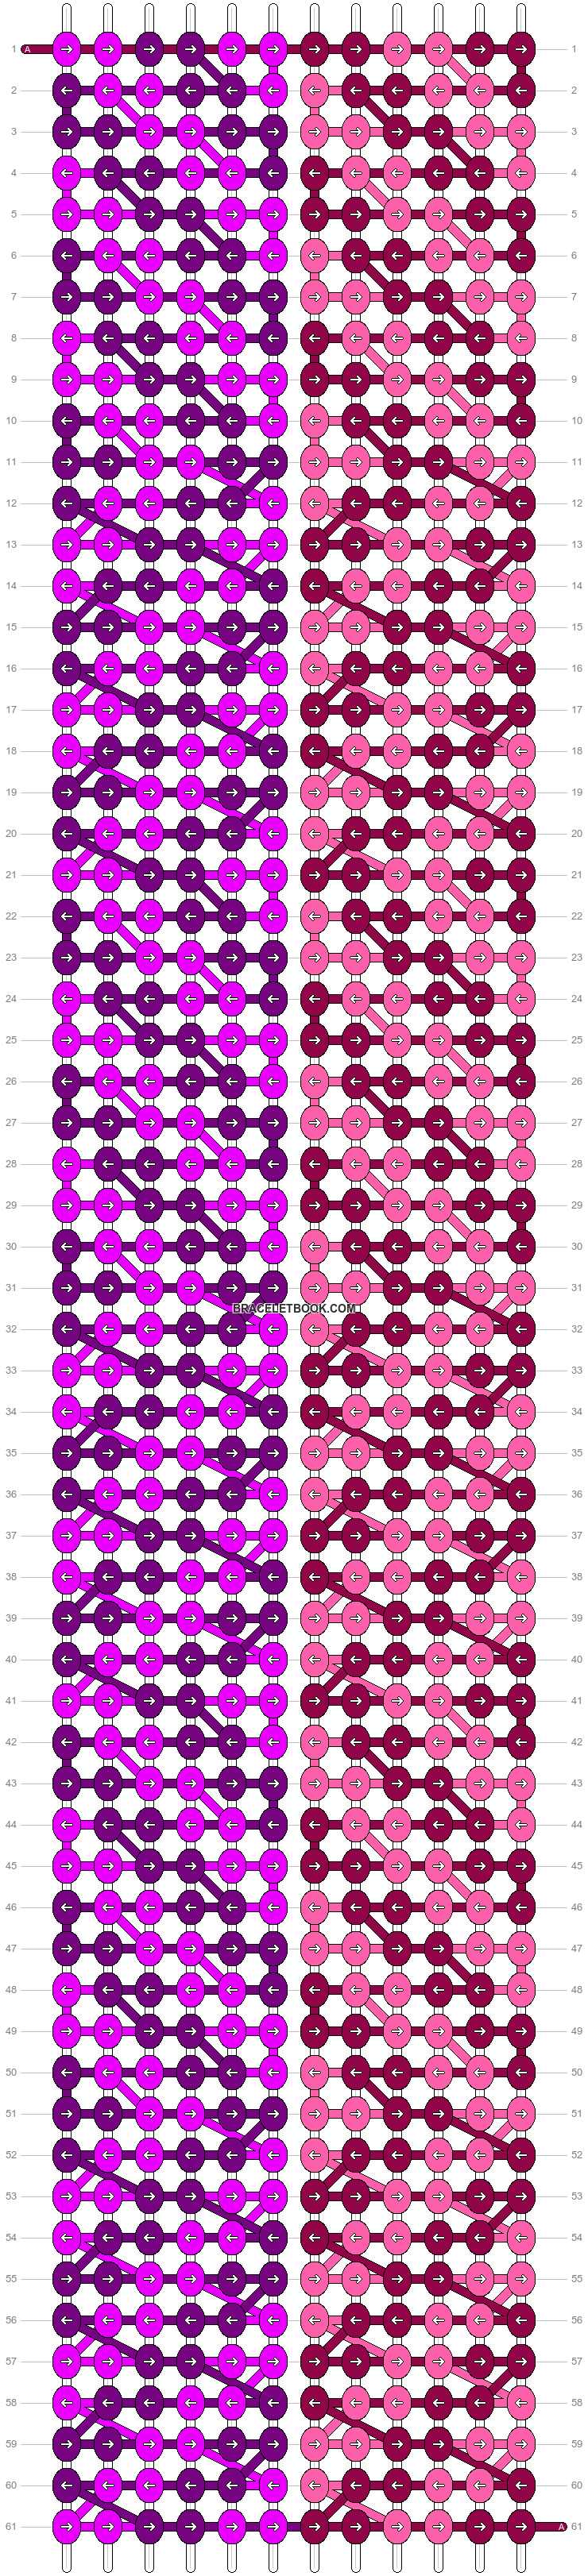 Alpha pattern #15401 pattern